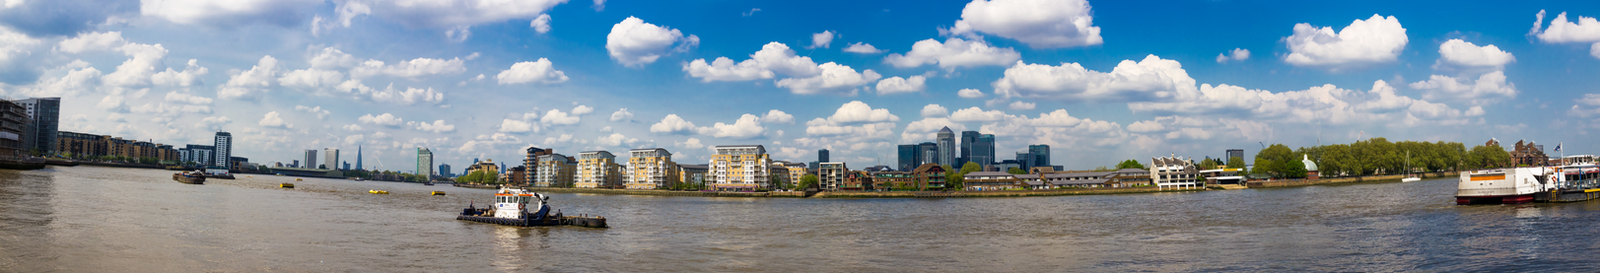 Greenwich Riverside by PixelPandaa